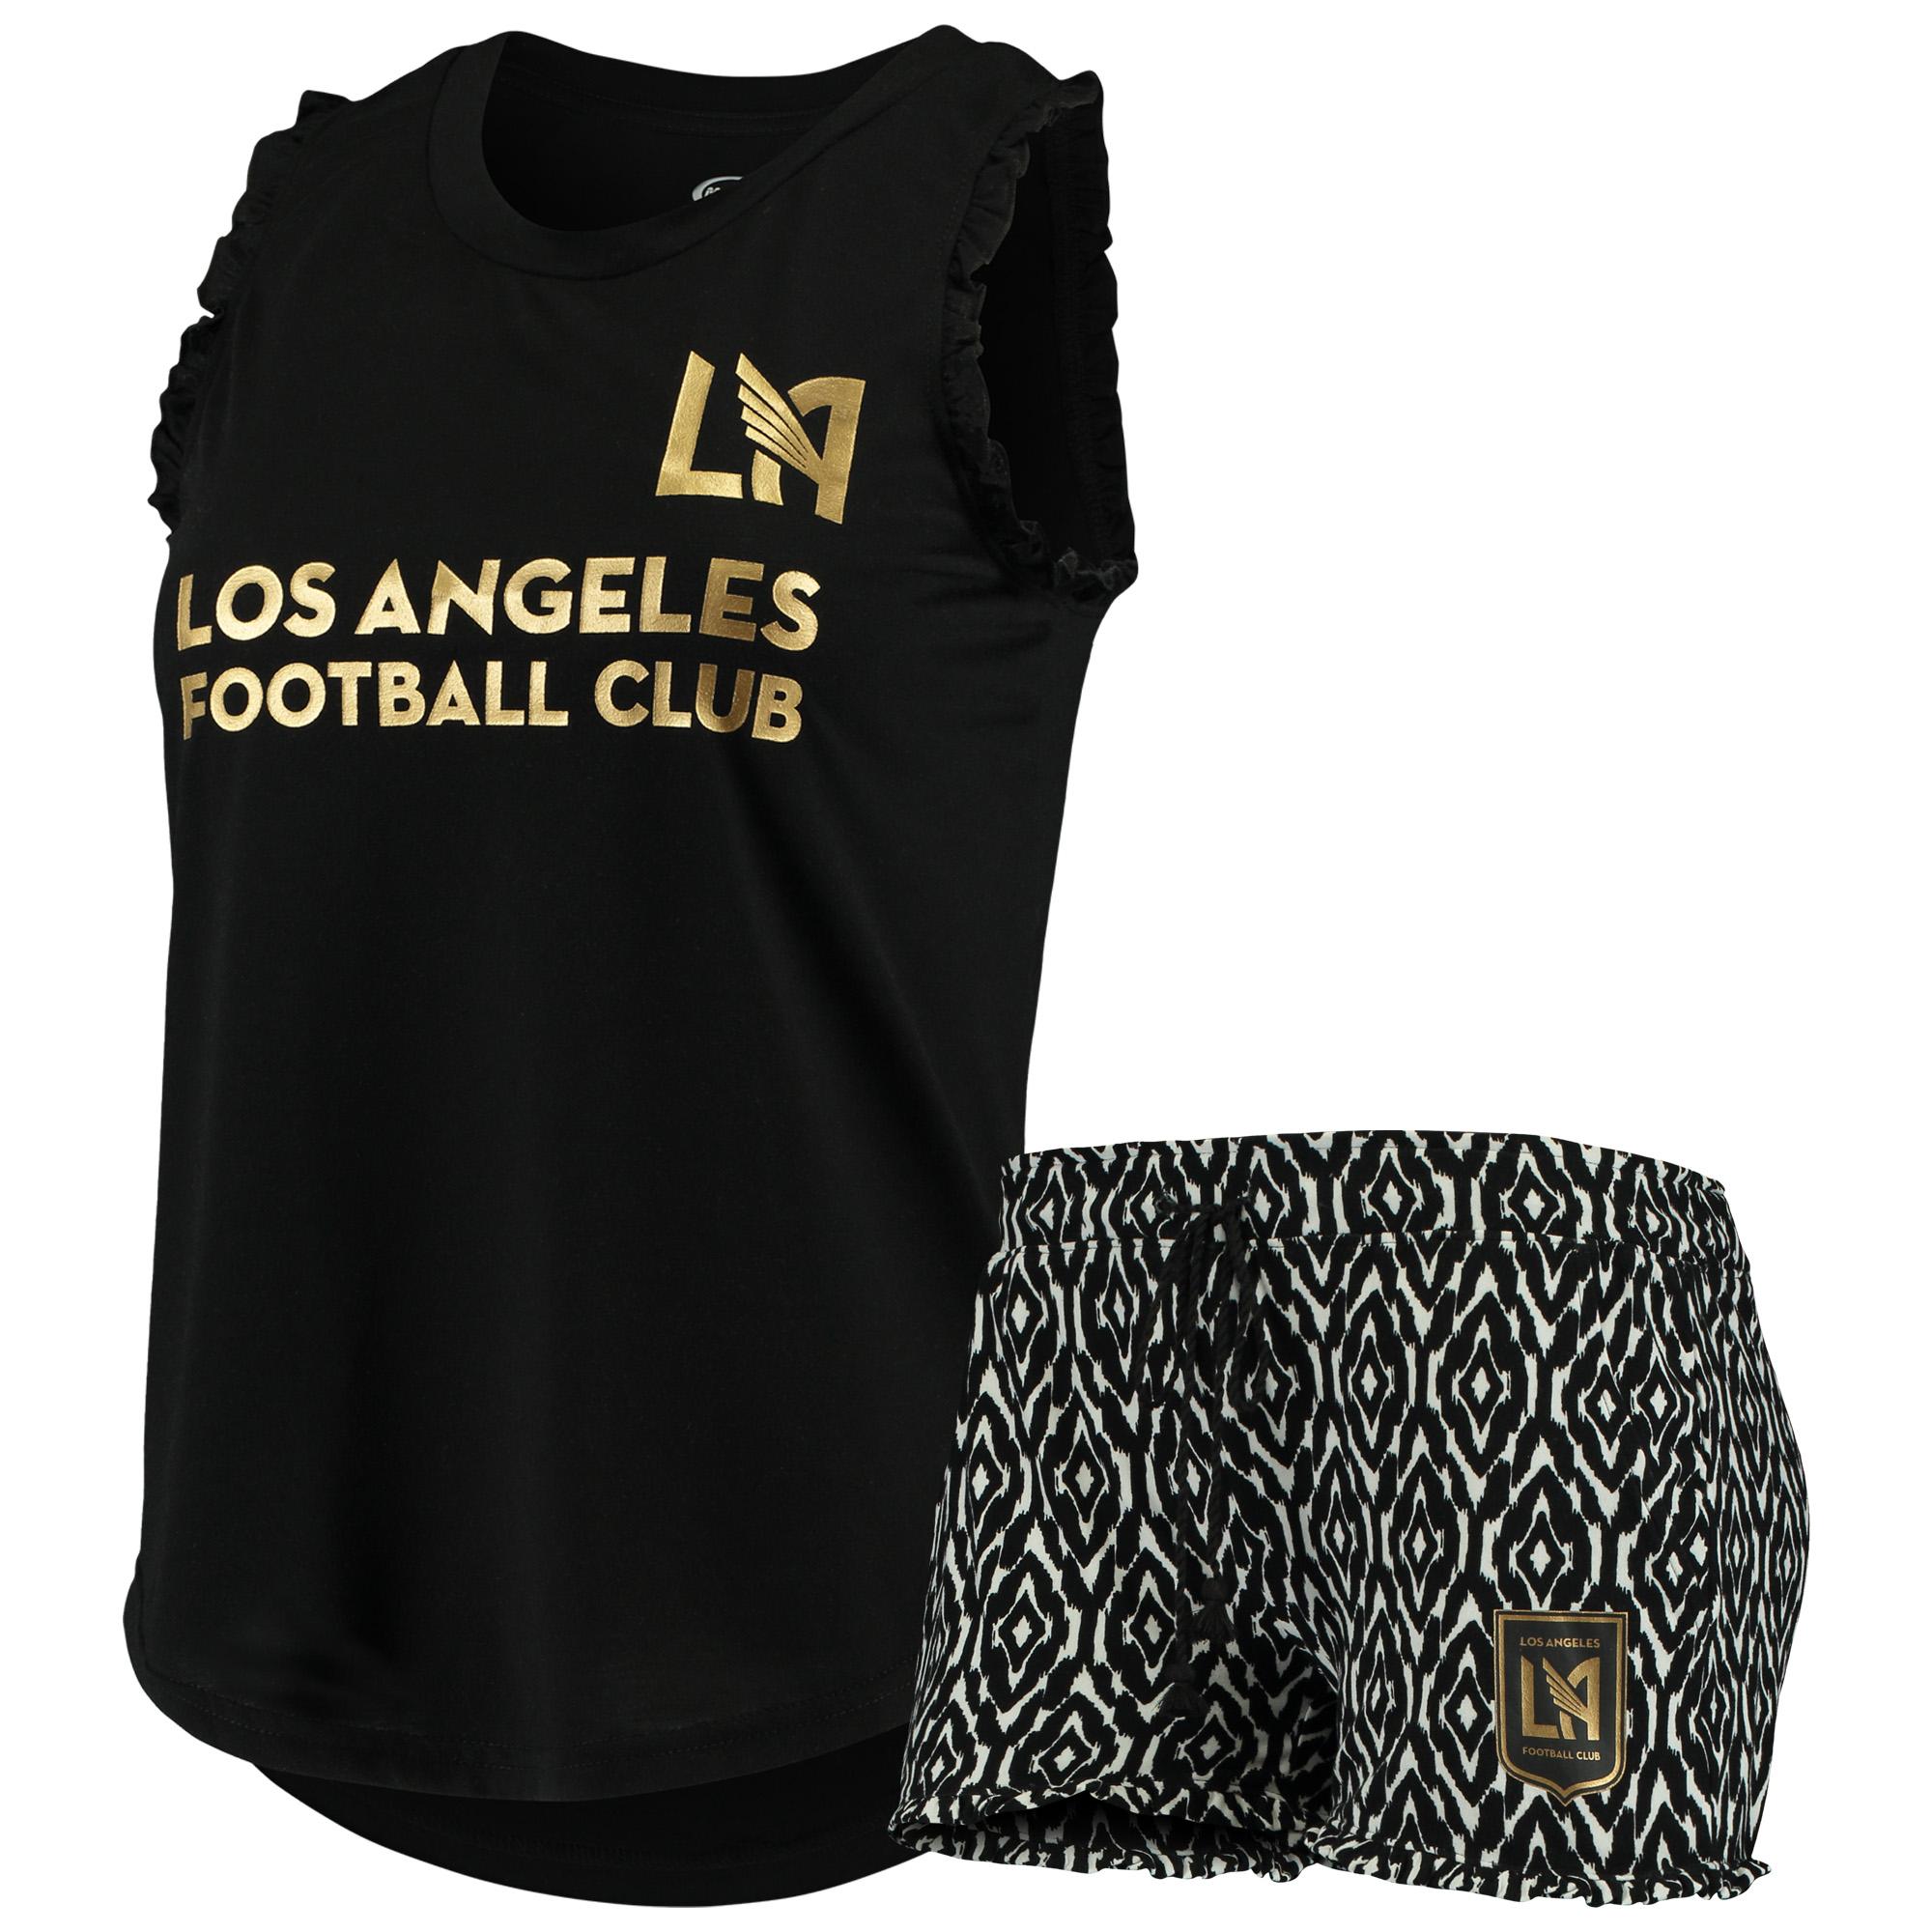 LAFC Concepts Sport Women's Unwind Tank Top & Shorts Pajama Set - Black/White